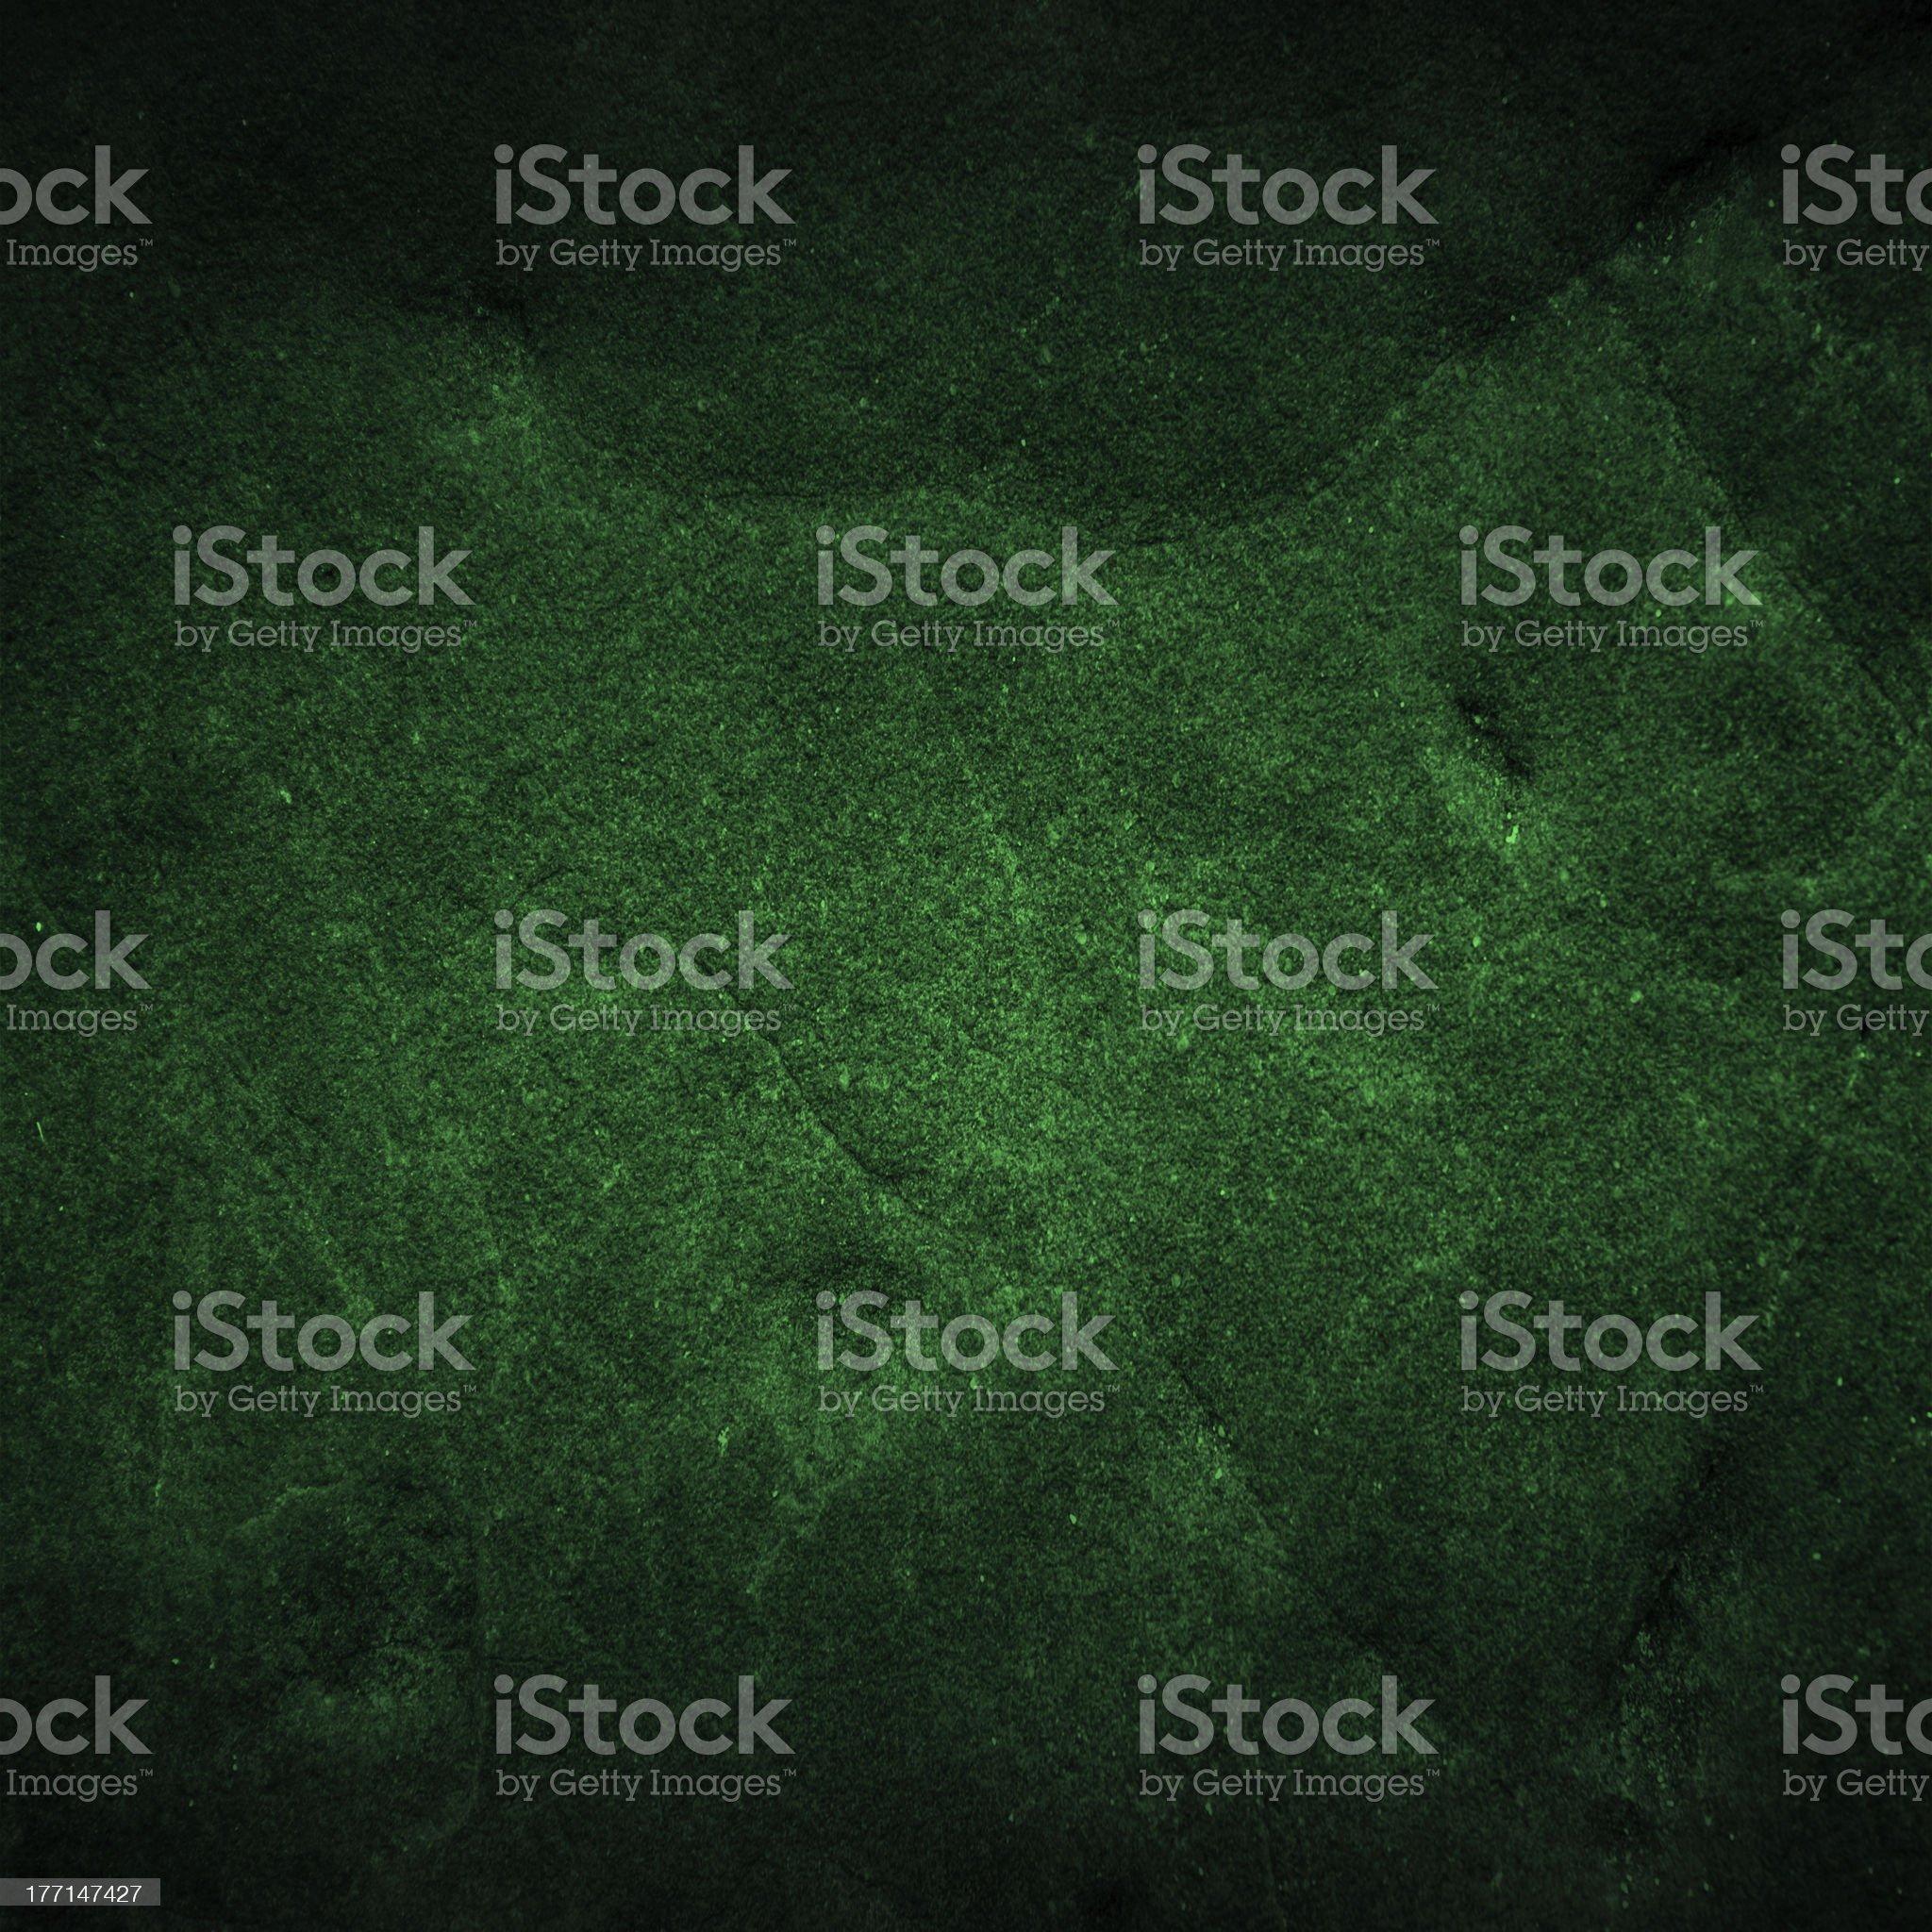 background royalty-free stock photo